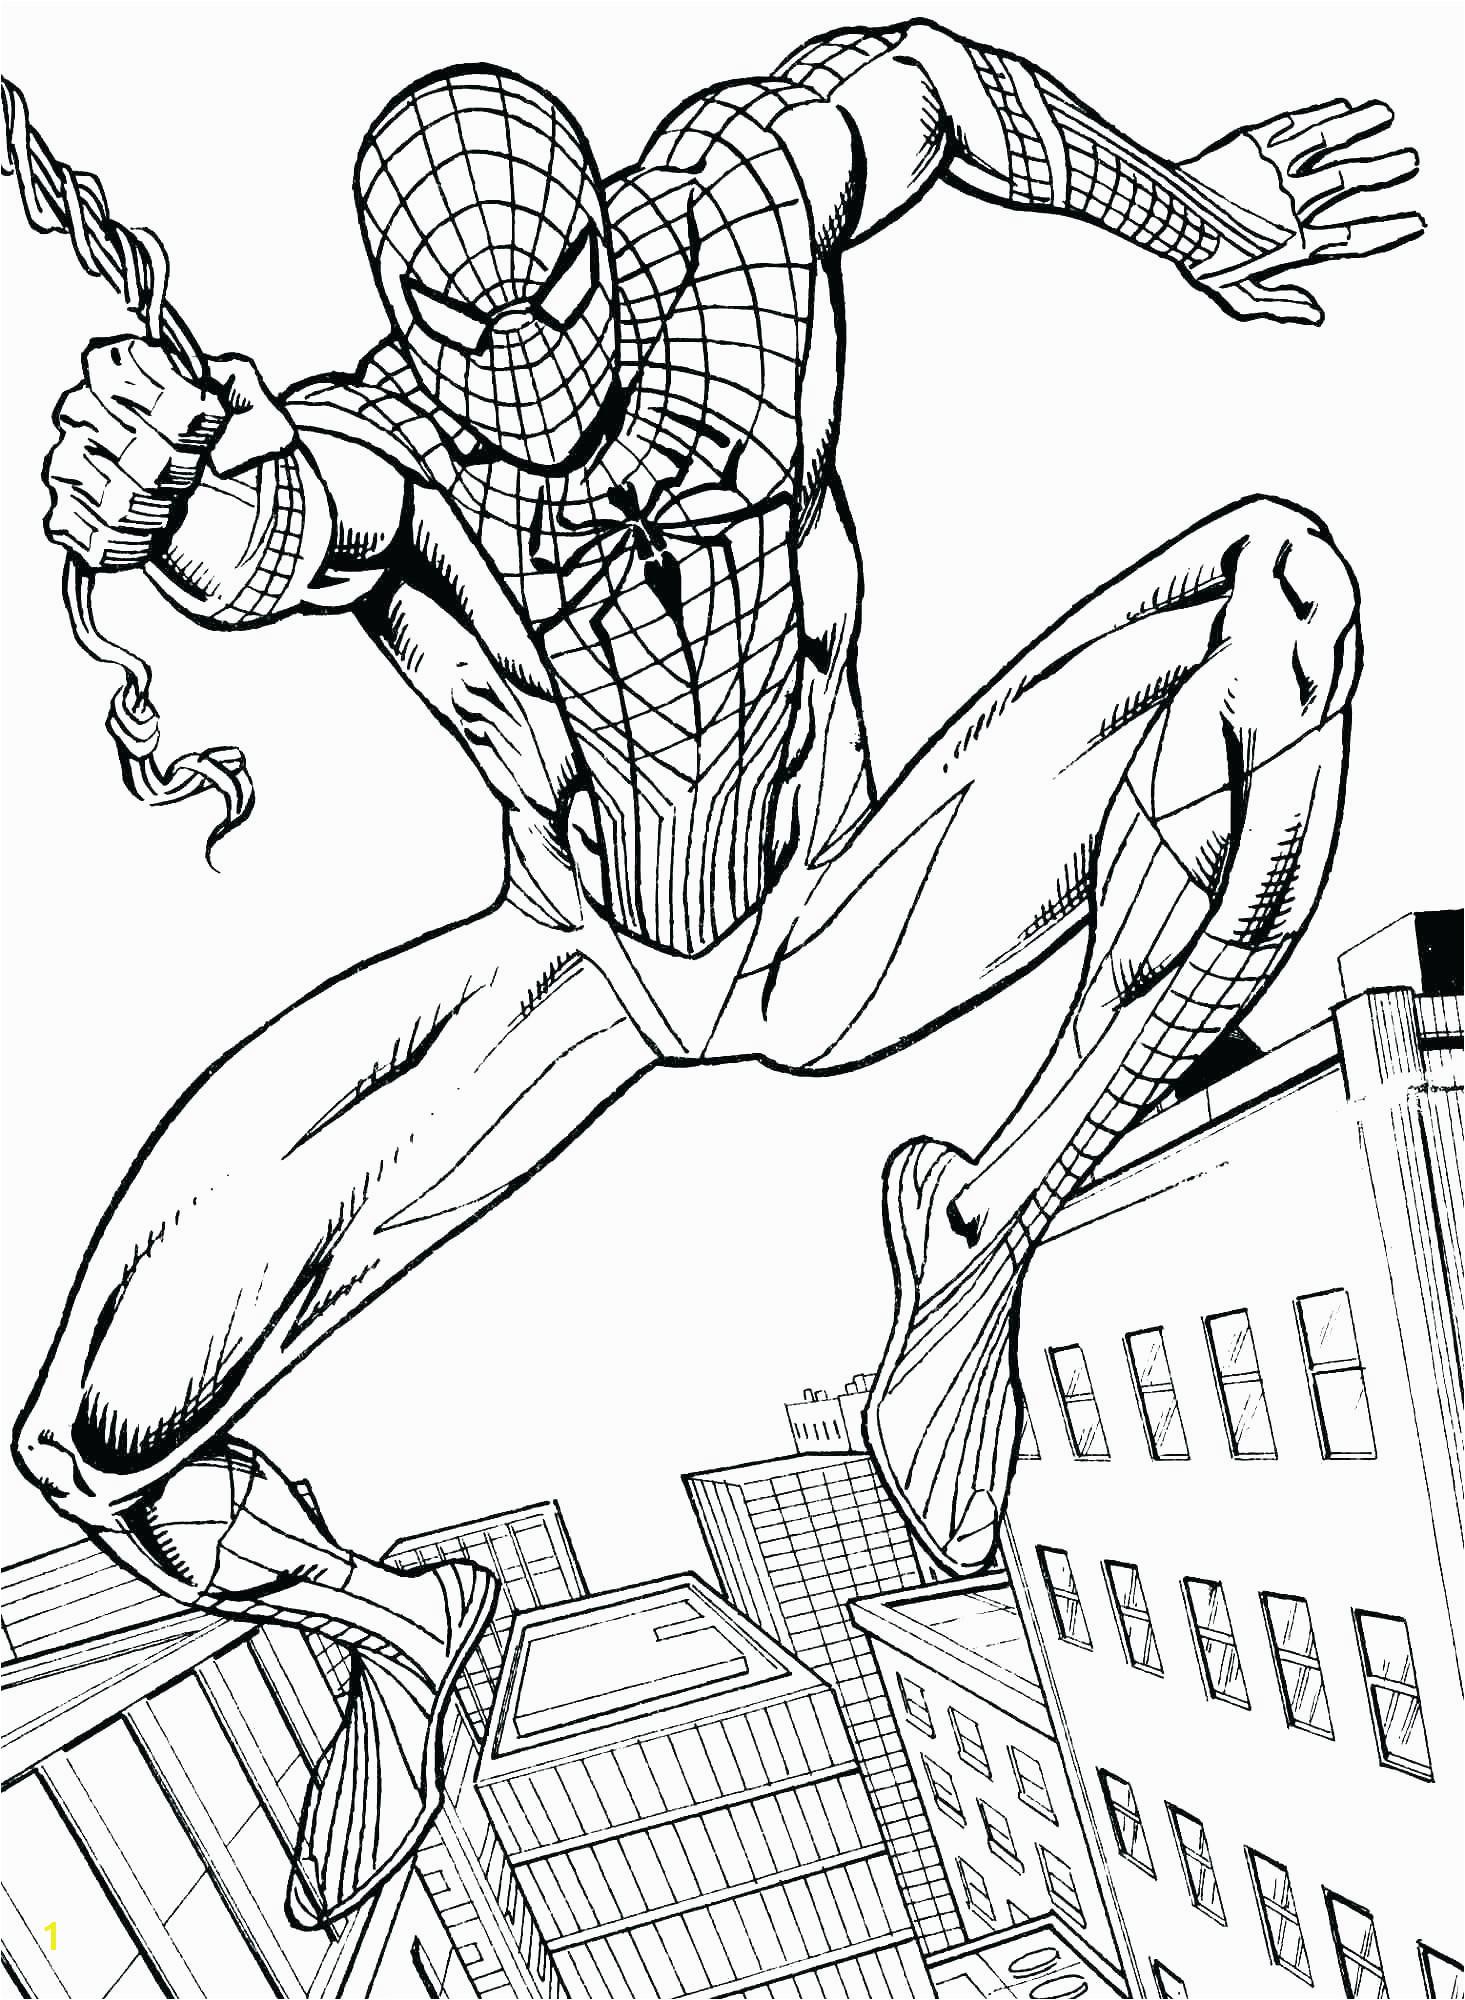 Spider Man and Sandman Coloring Pages | divyajanani.org